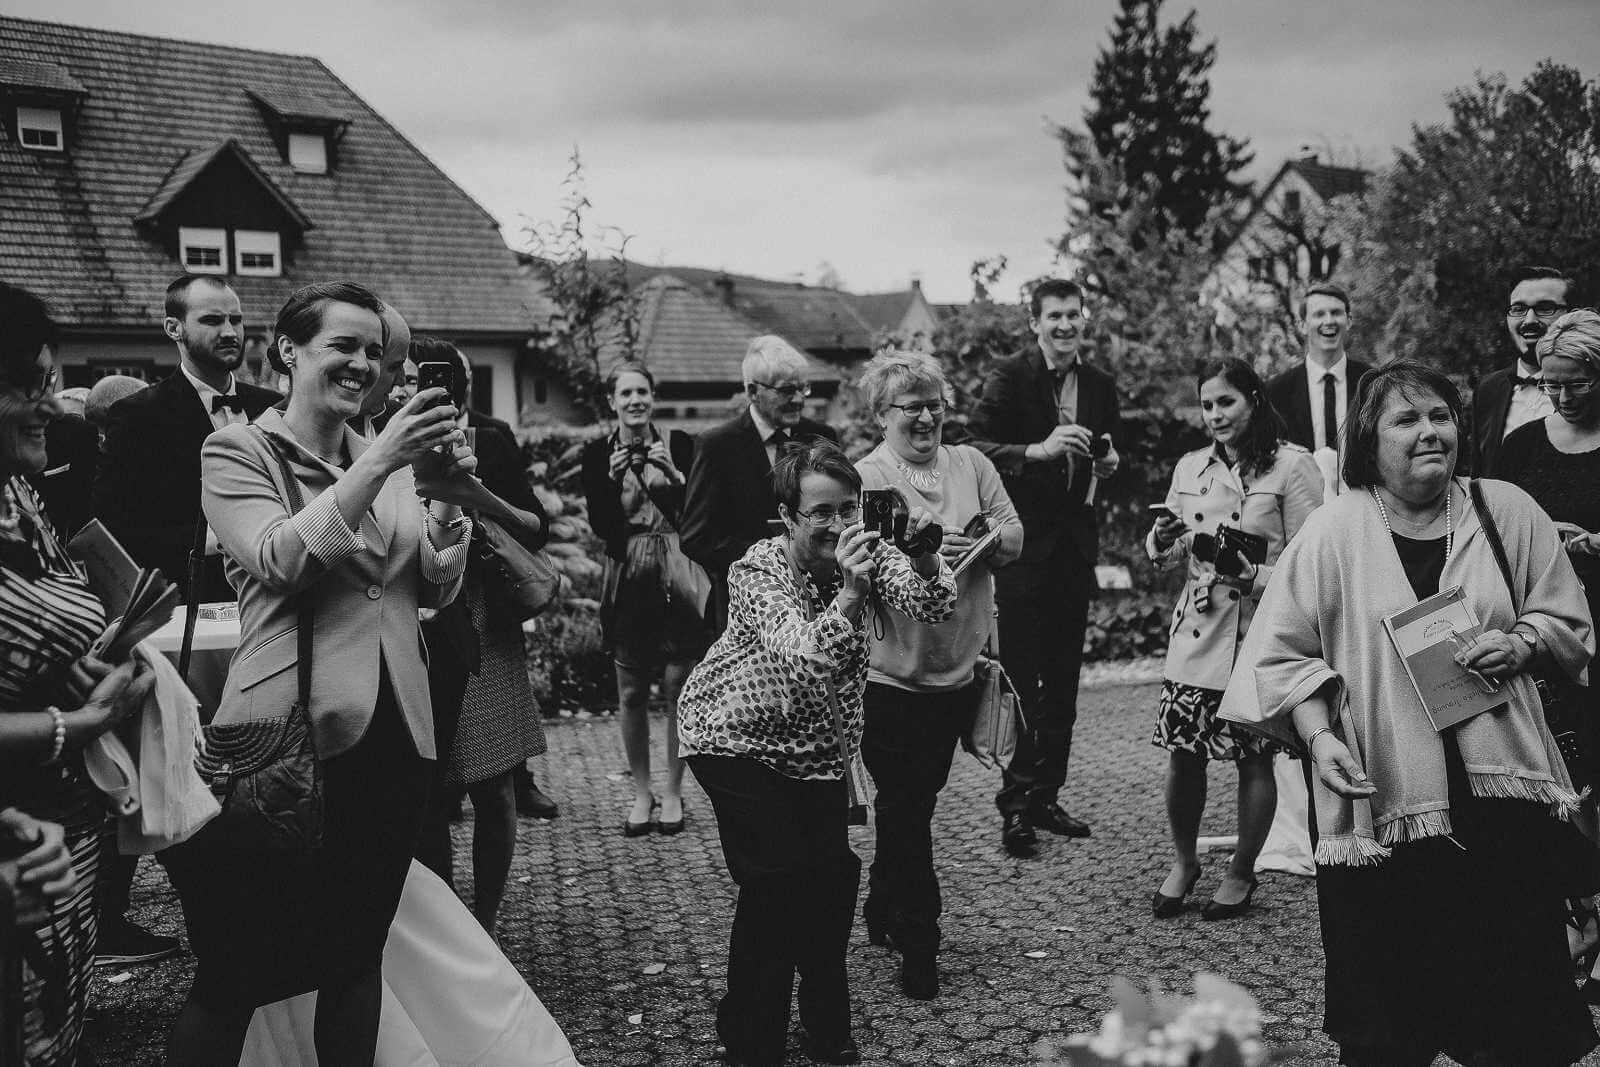 Hochzeitsfotograf Offenburg Zell am Harmersbach Bärenkeller (48)